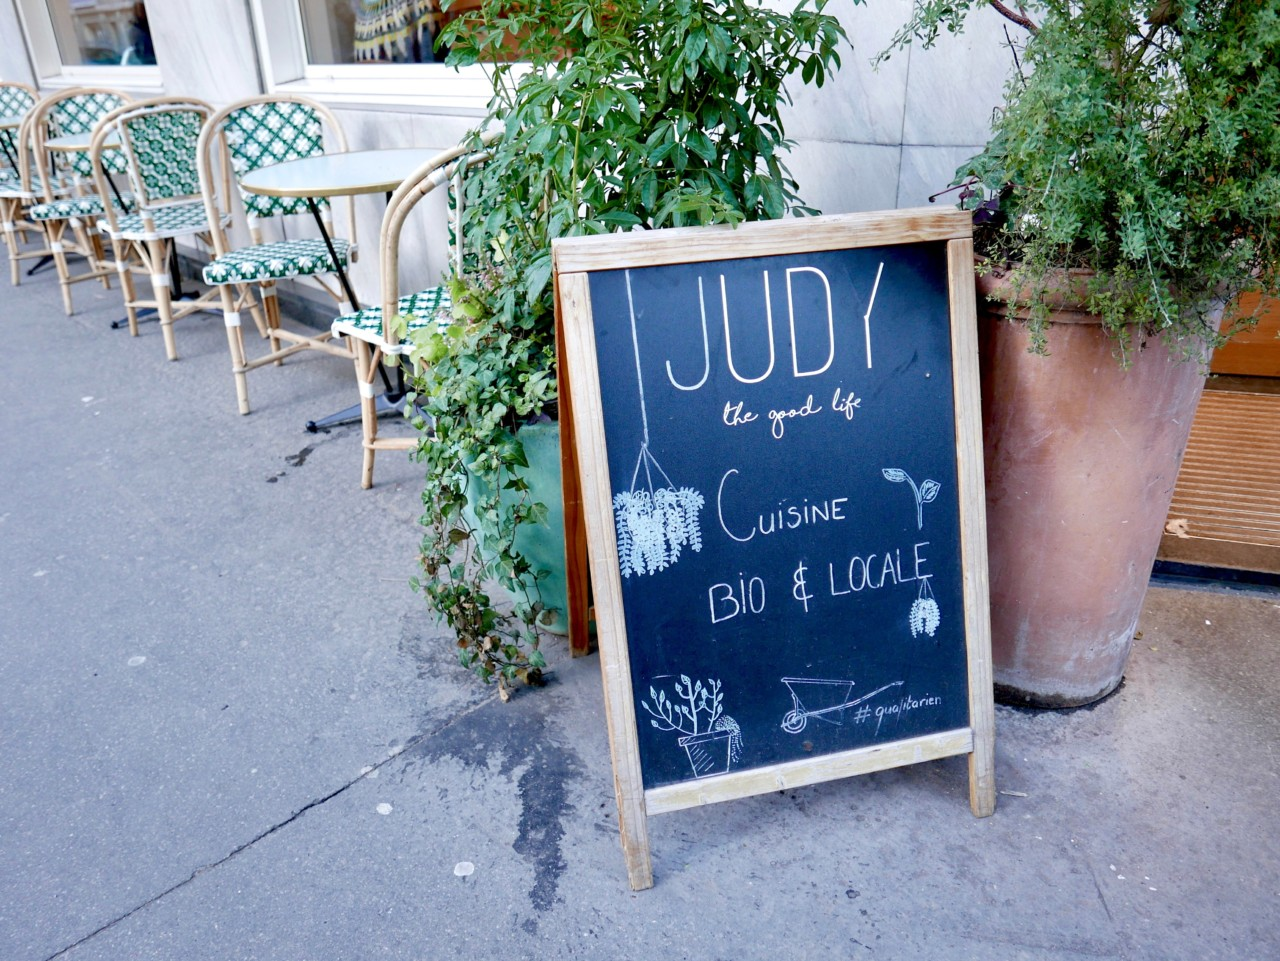 judy-paris-cantine-qualitarienne-plantebasert-st-germain